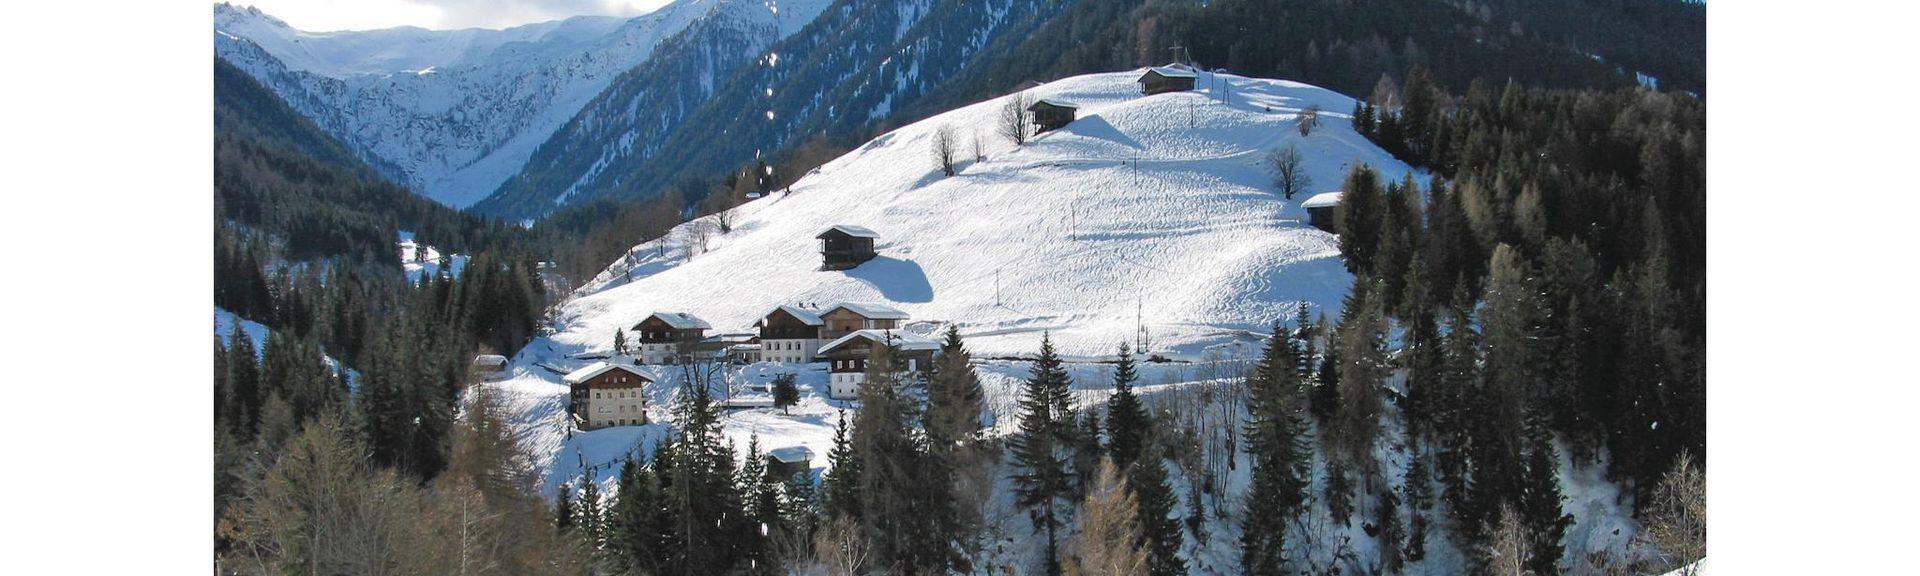 Untertilliach, Tyrol, Austria